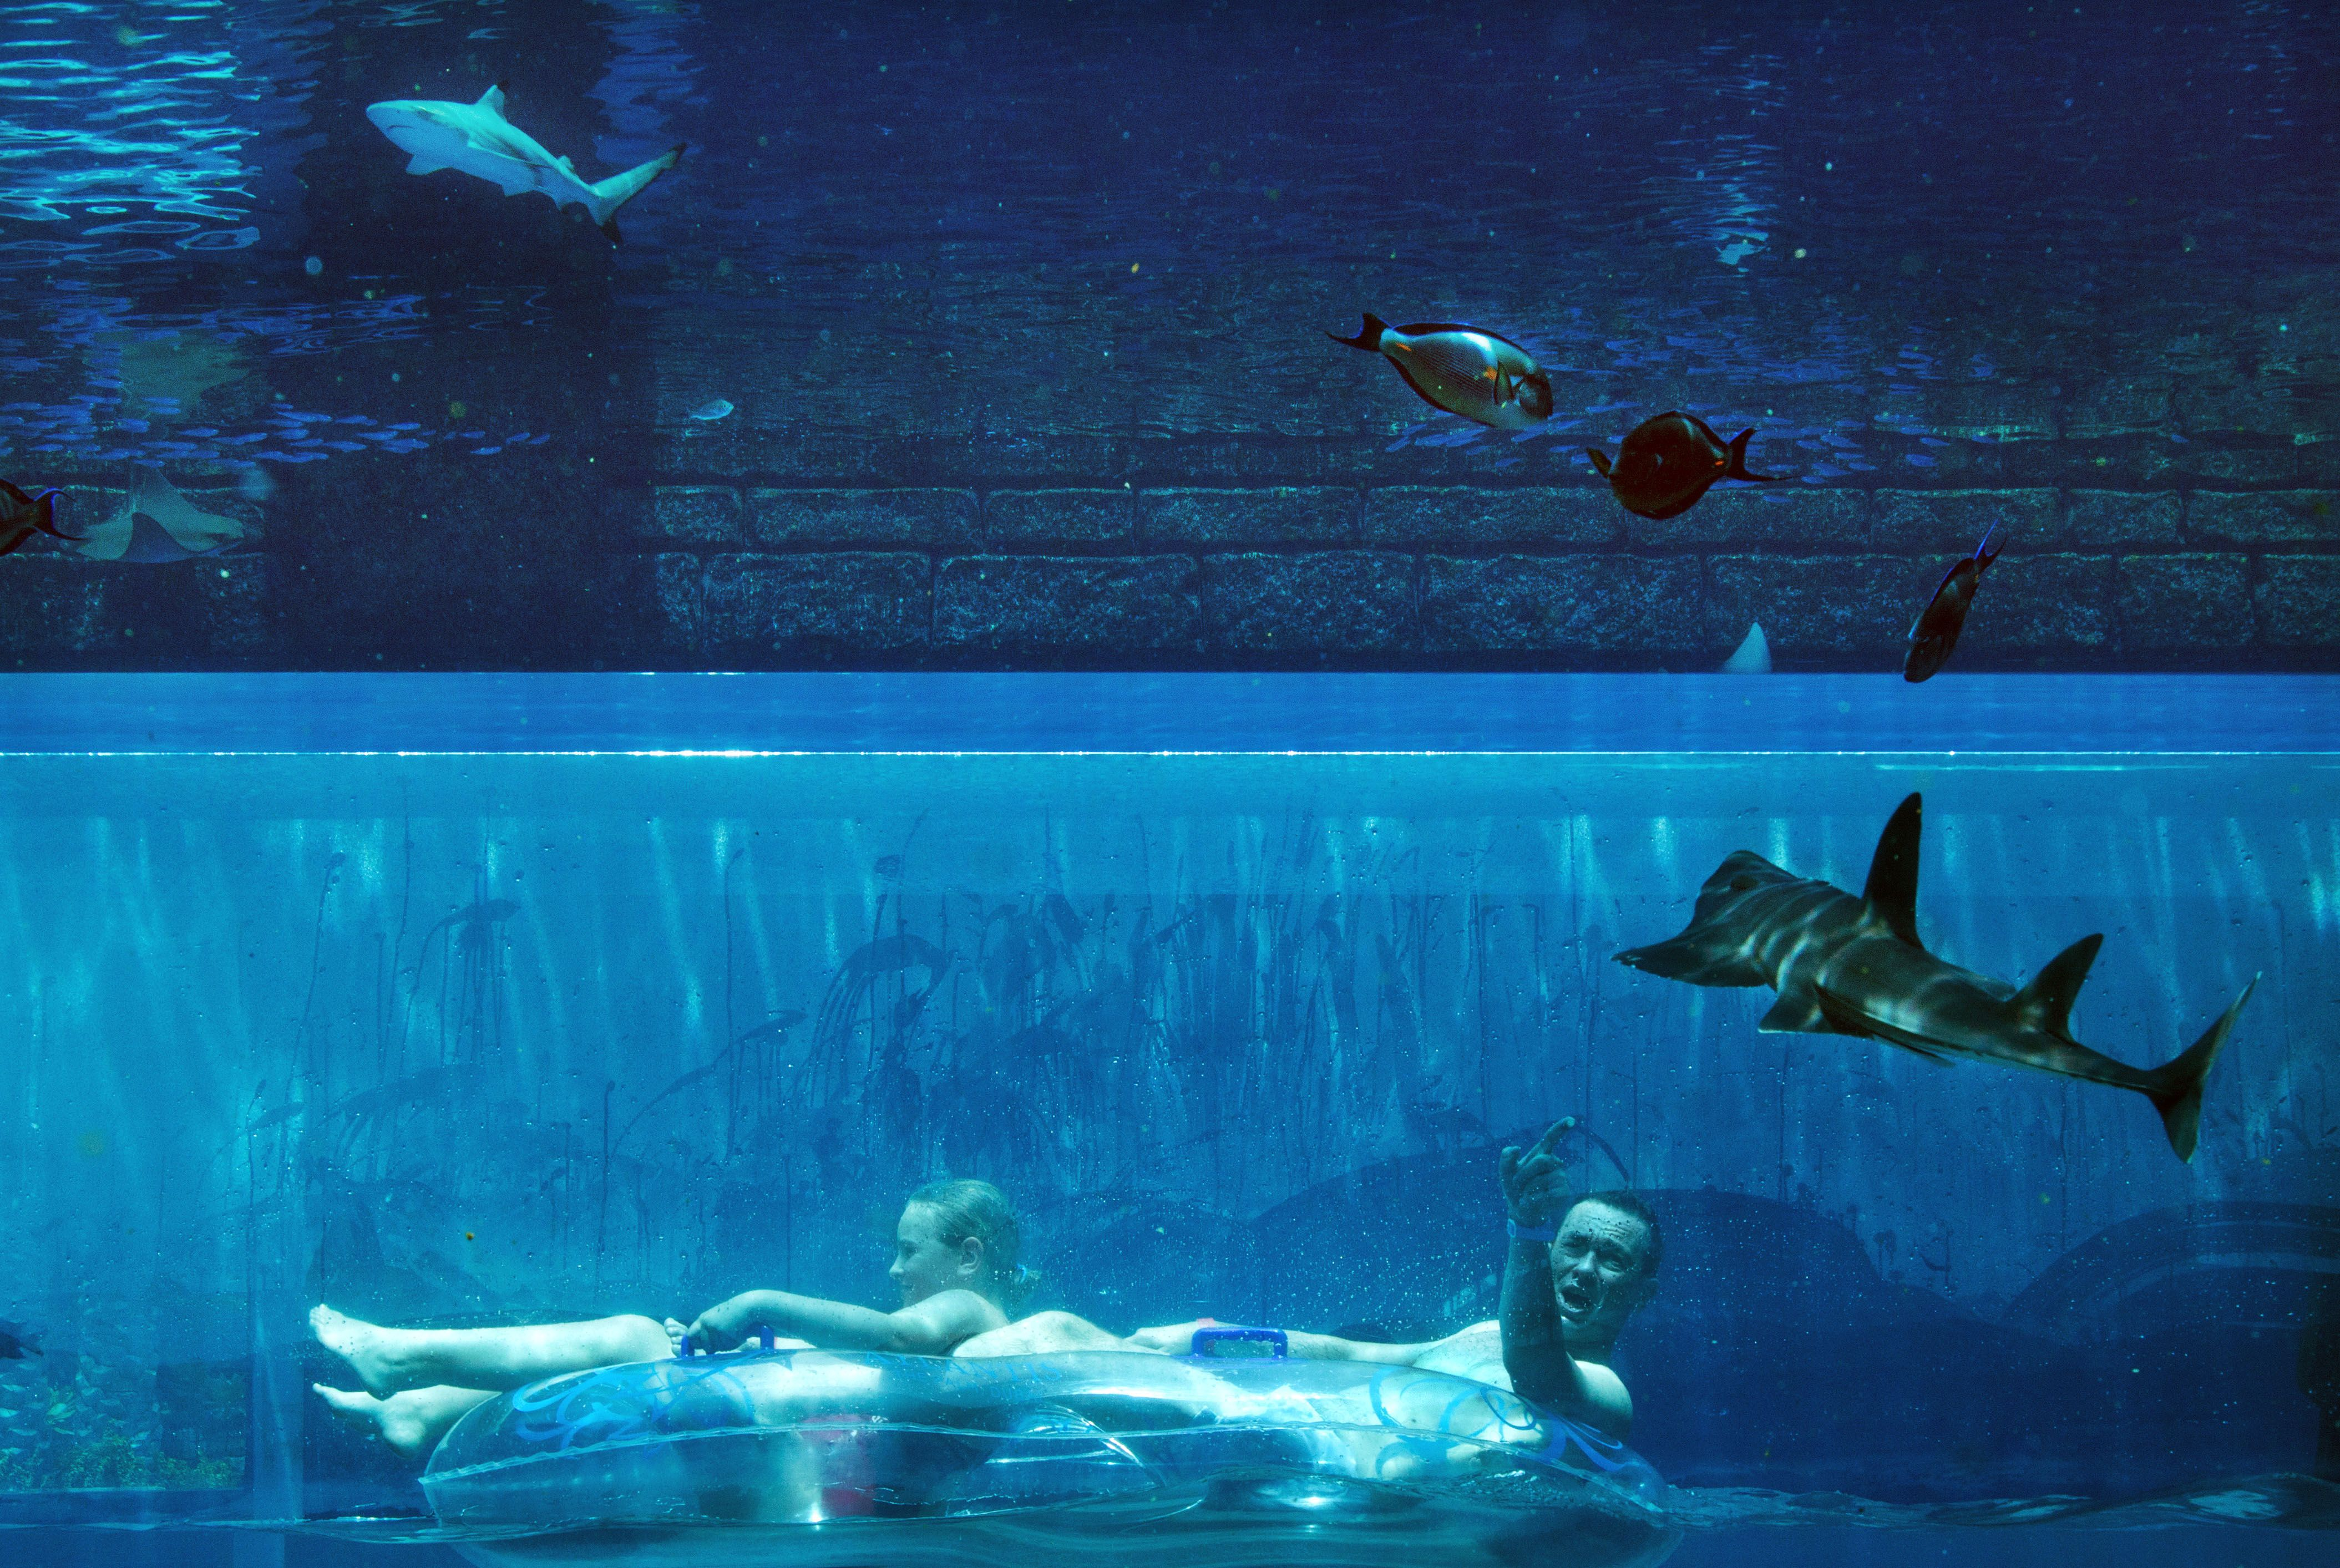 underwater water slide. A Man Points At Shark While He Slides Through An Underwater Tunnel Hotel Water Slide